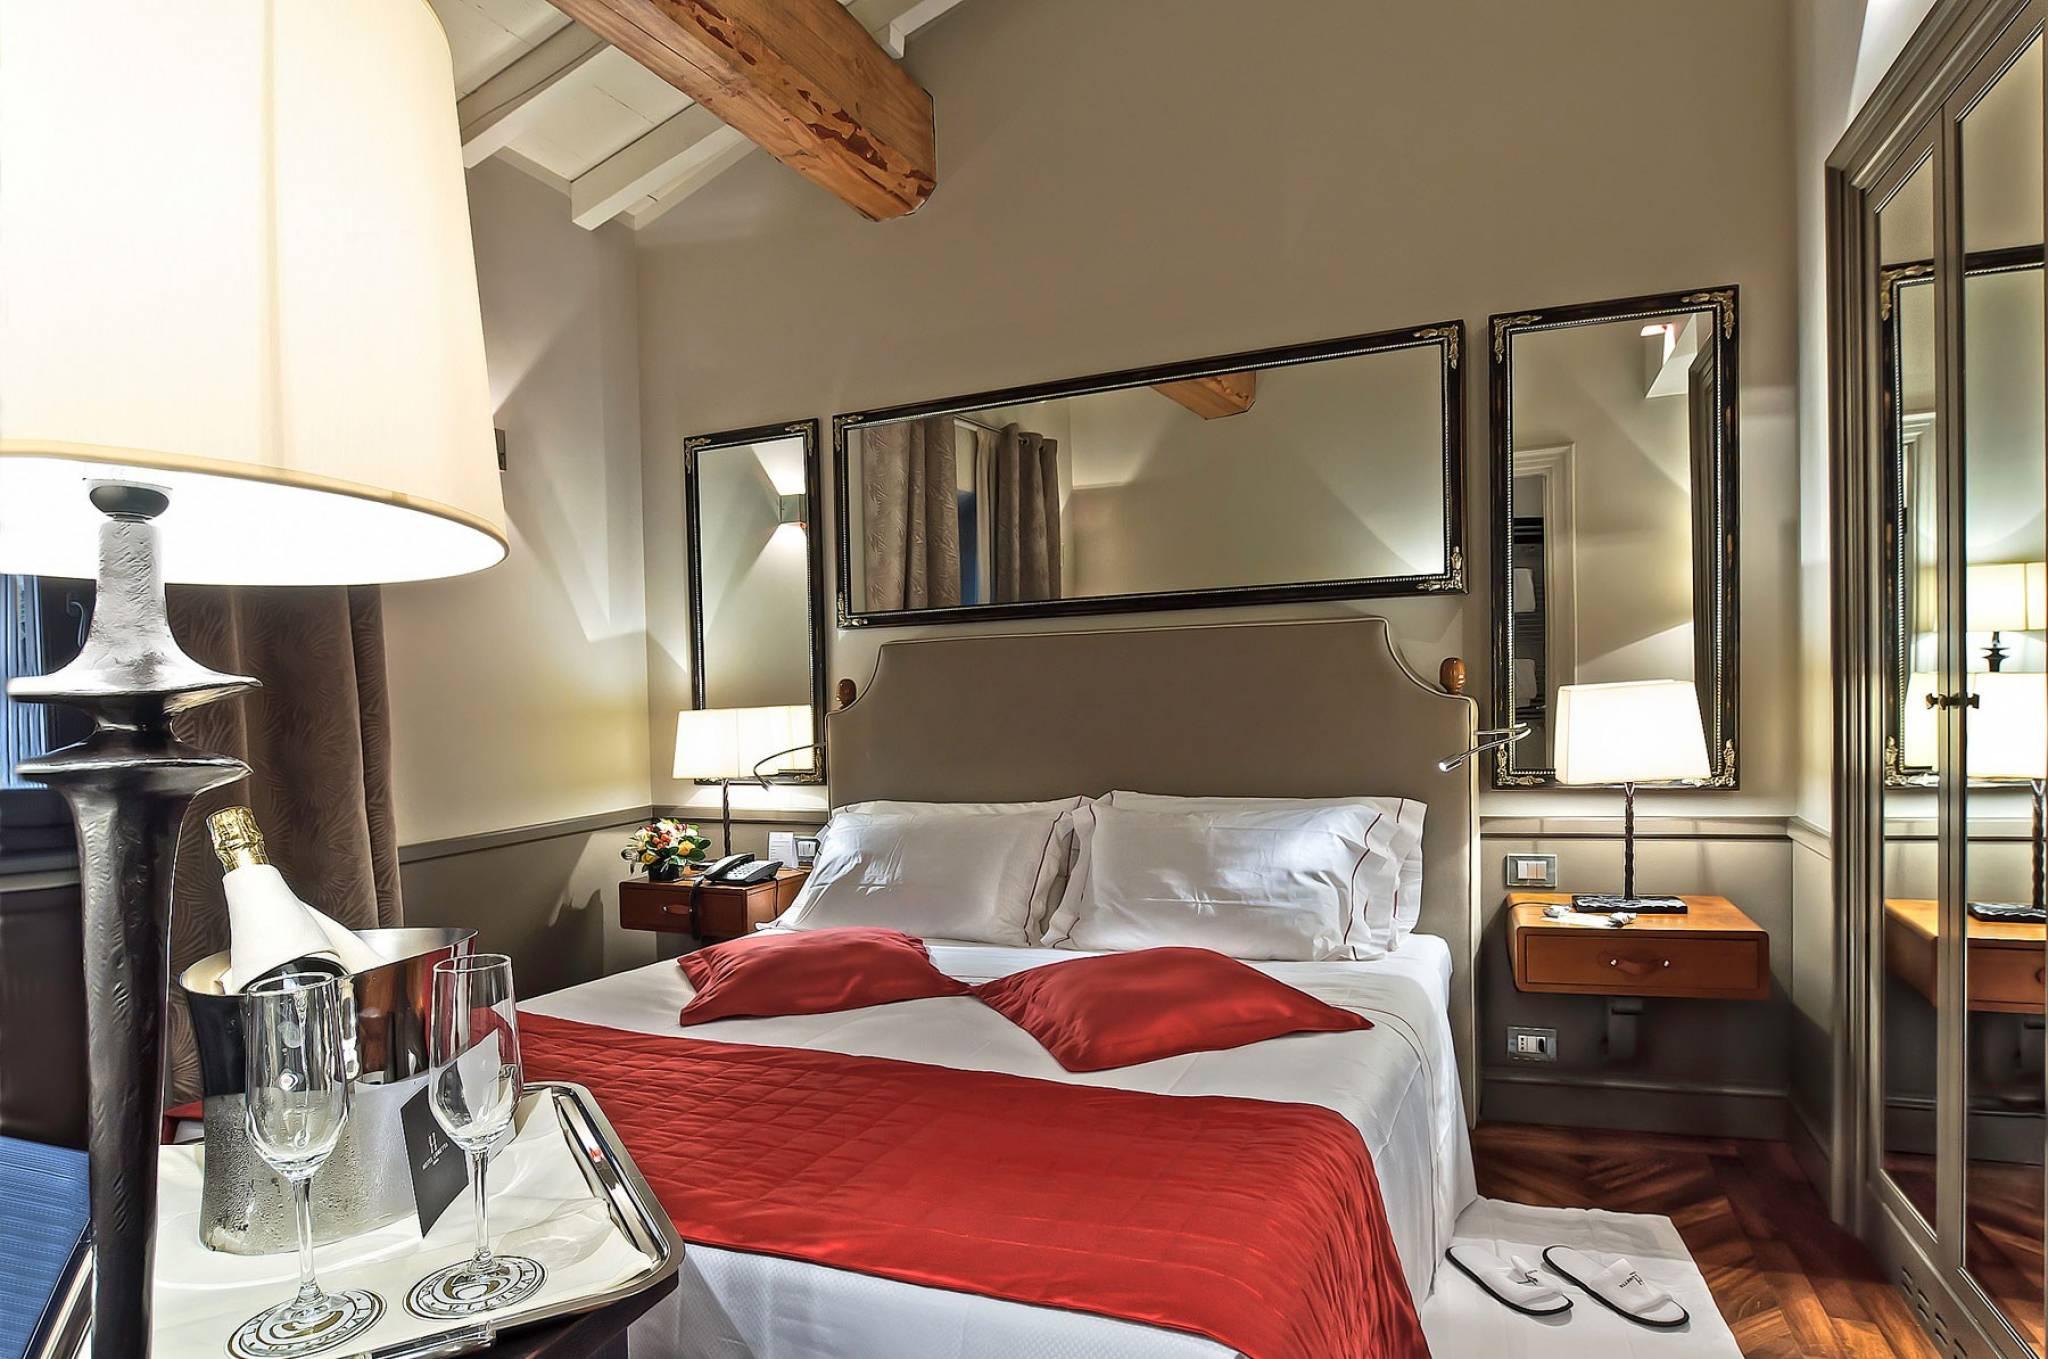 hotel-lunetta-rooms-09.jpg